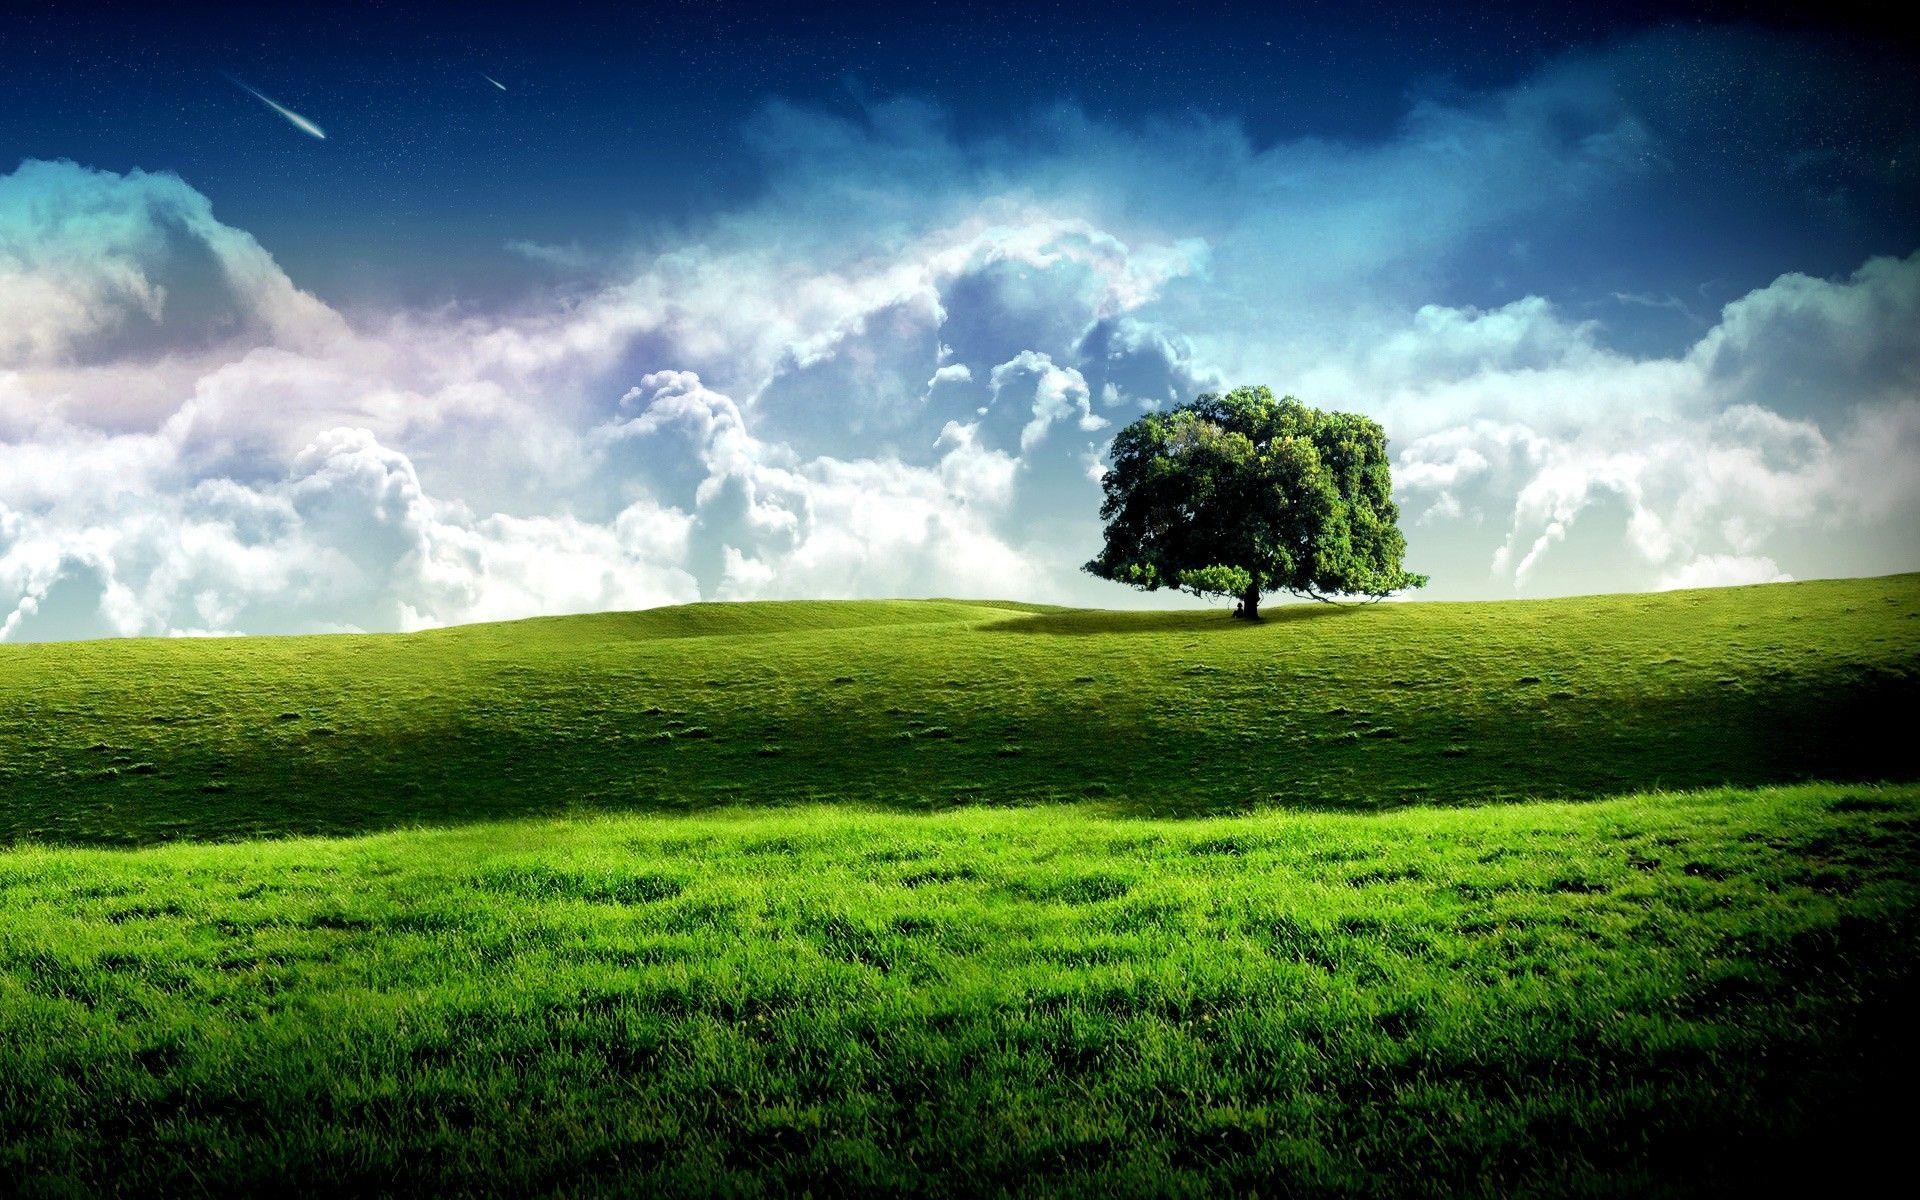 Natural Landscape Wallpaper Hd Wallpapers Pretty In 2020 Landscape Wallpaper Landscape Photography Beautiful Nature